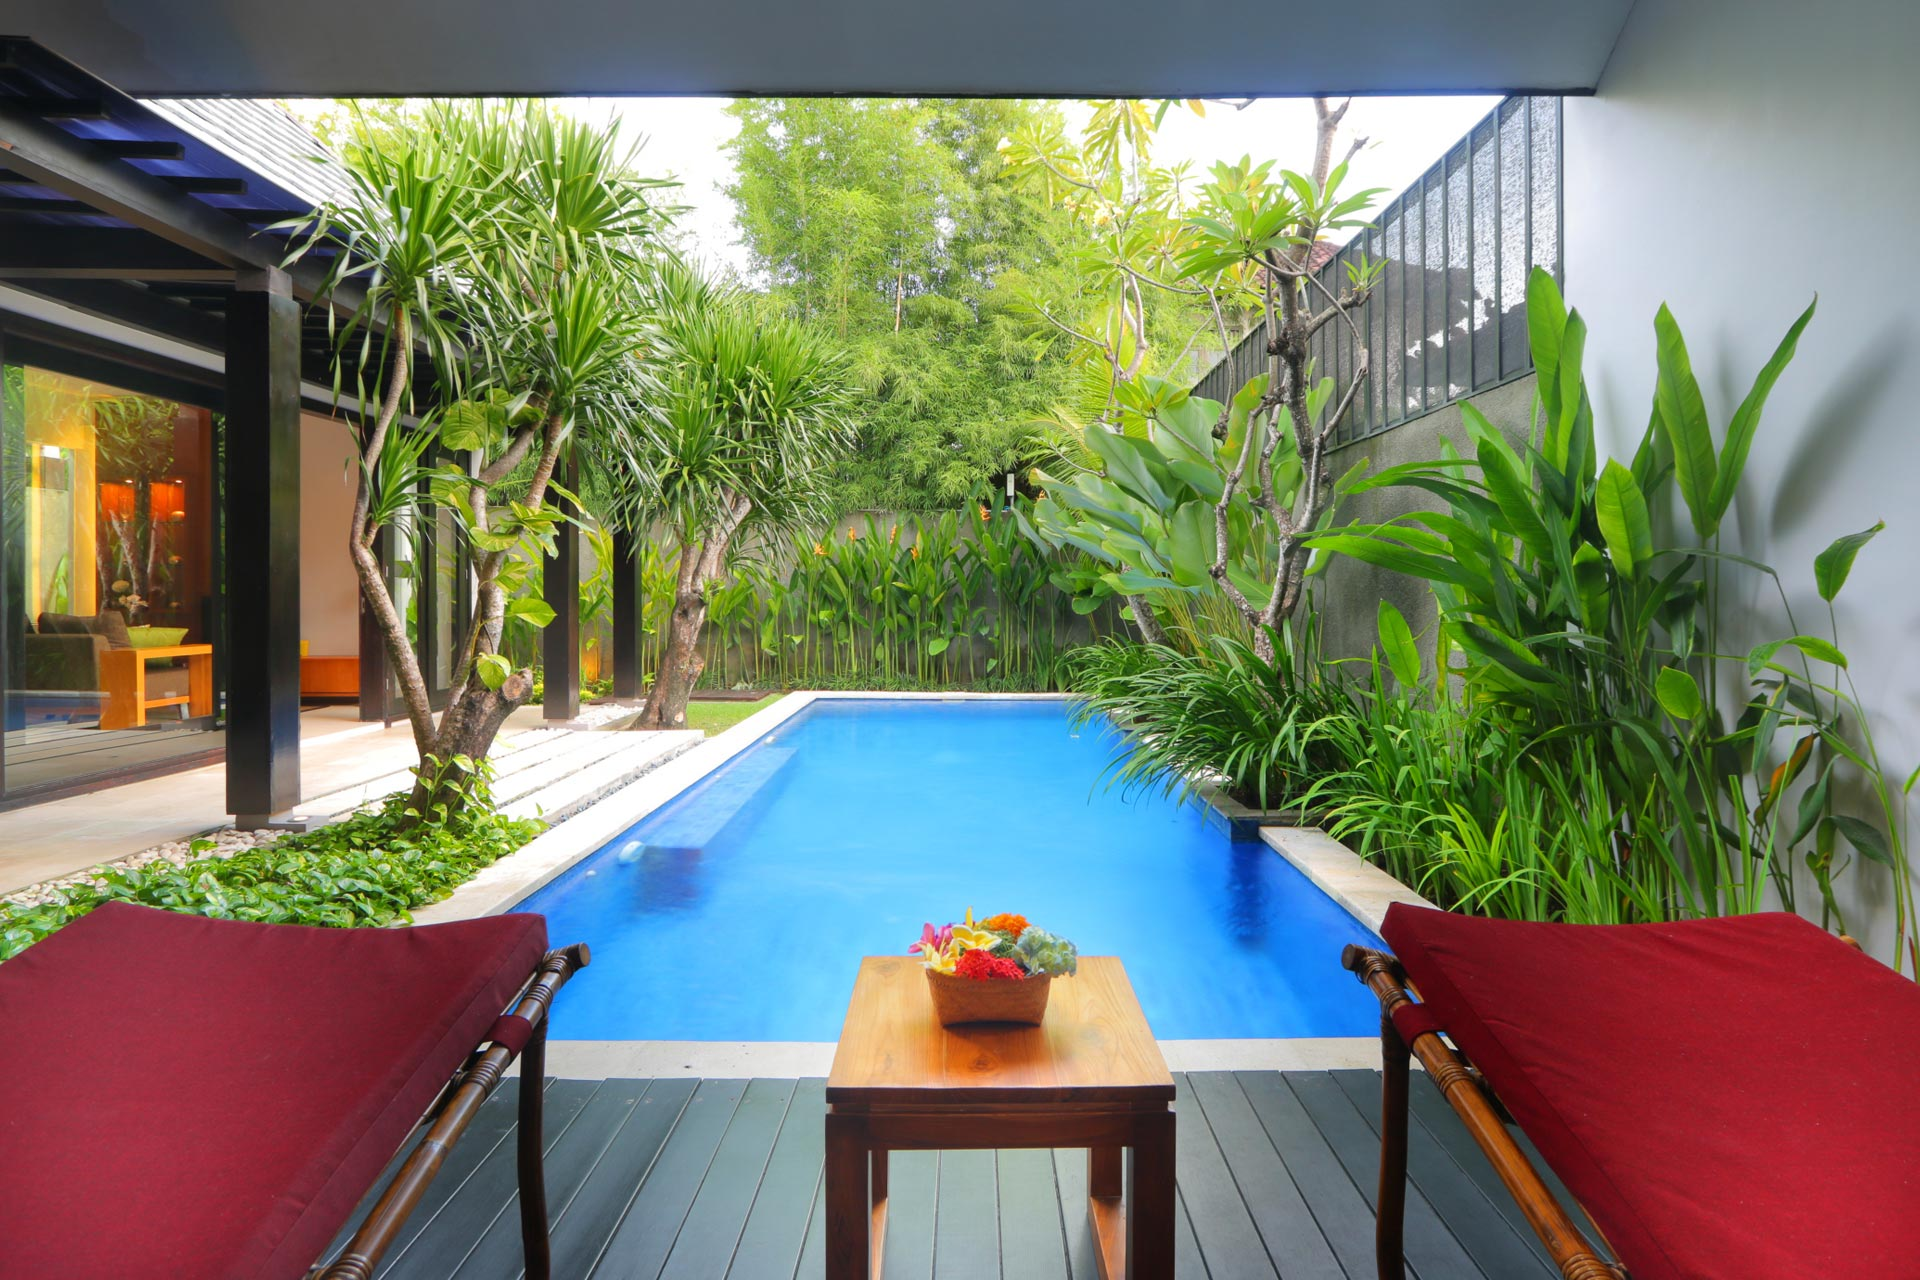 Private Pool Vilas Seminyak Bali The Jineng Villas By Ekosistem Hotels And Resorts Official Website